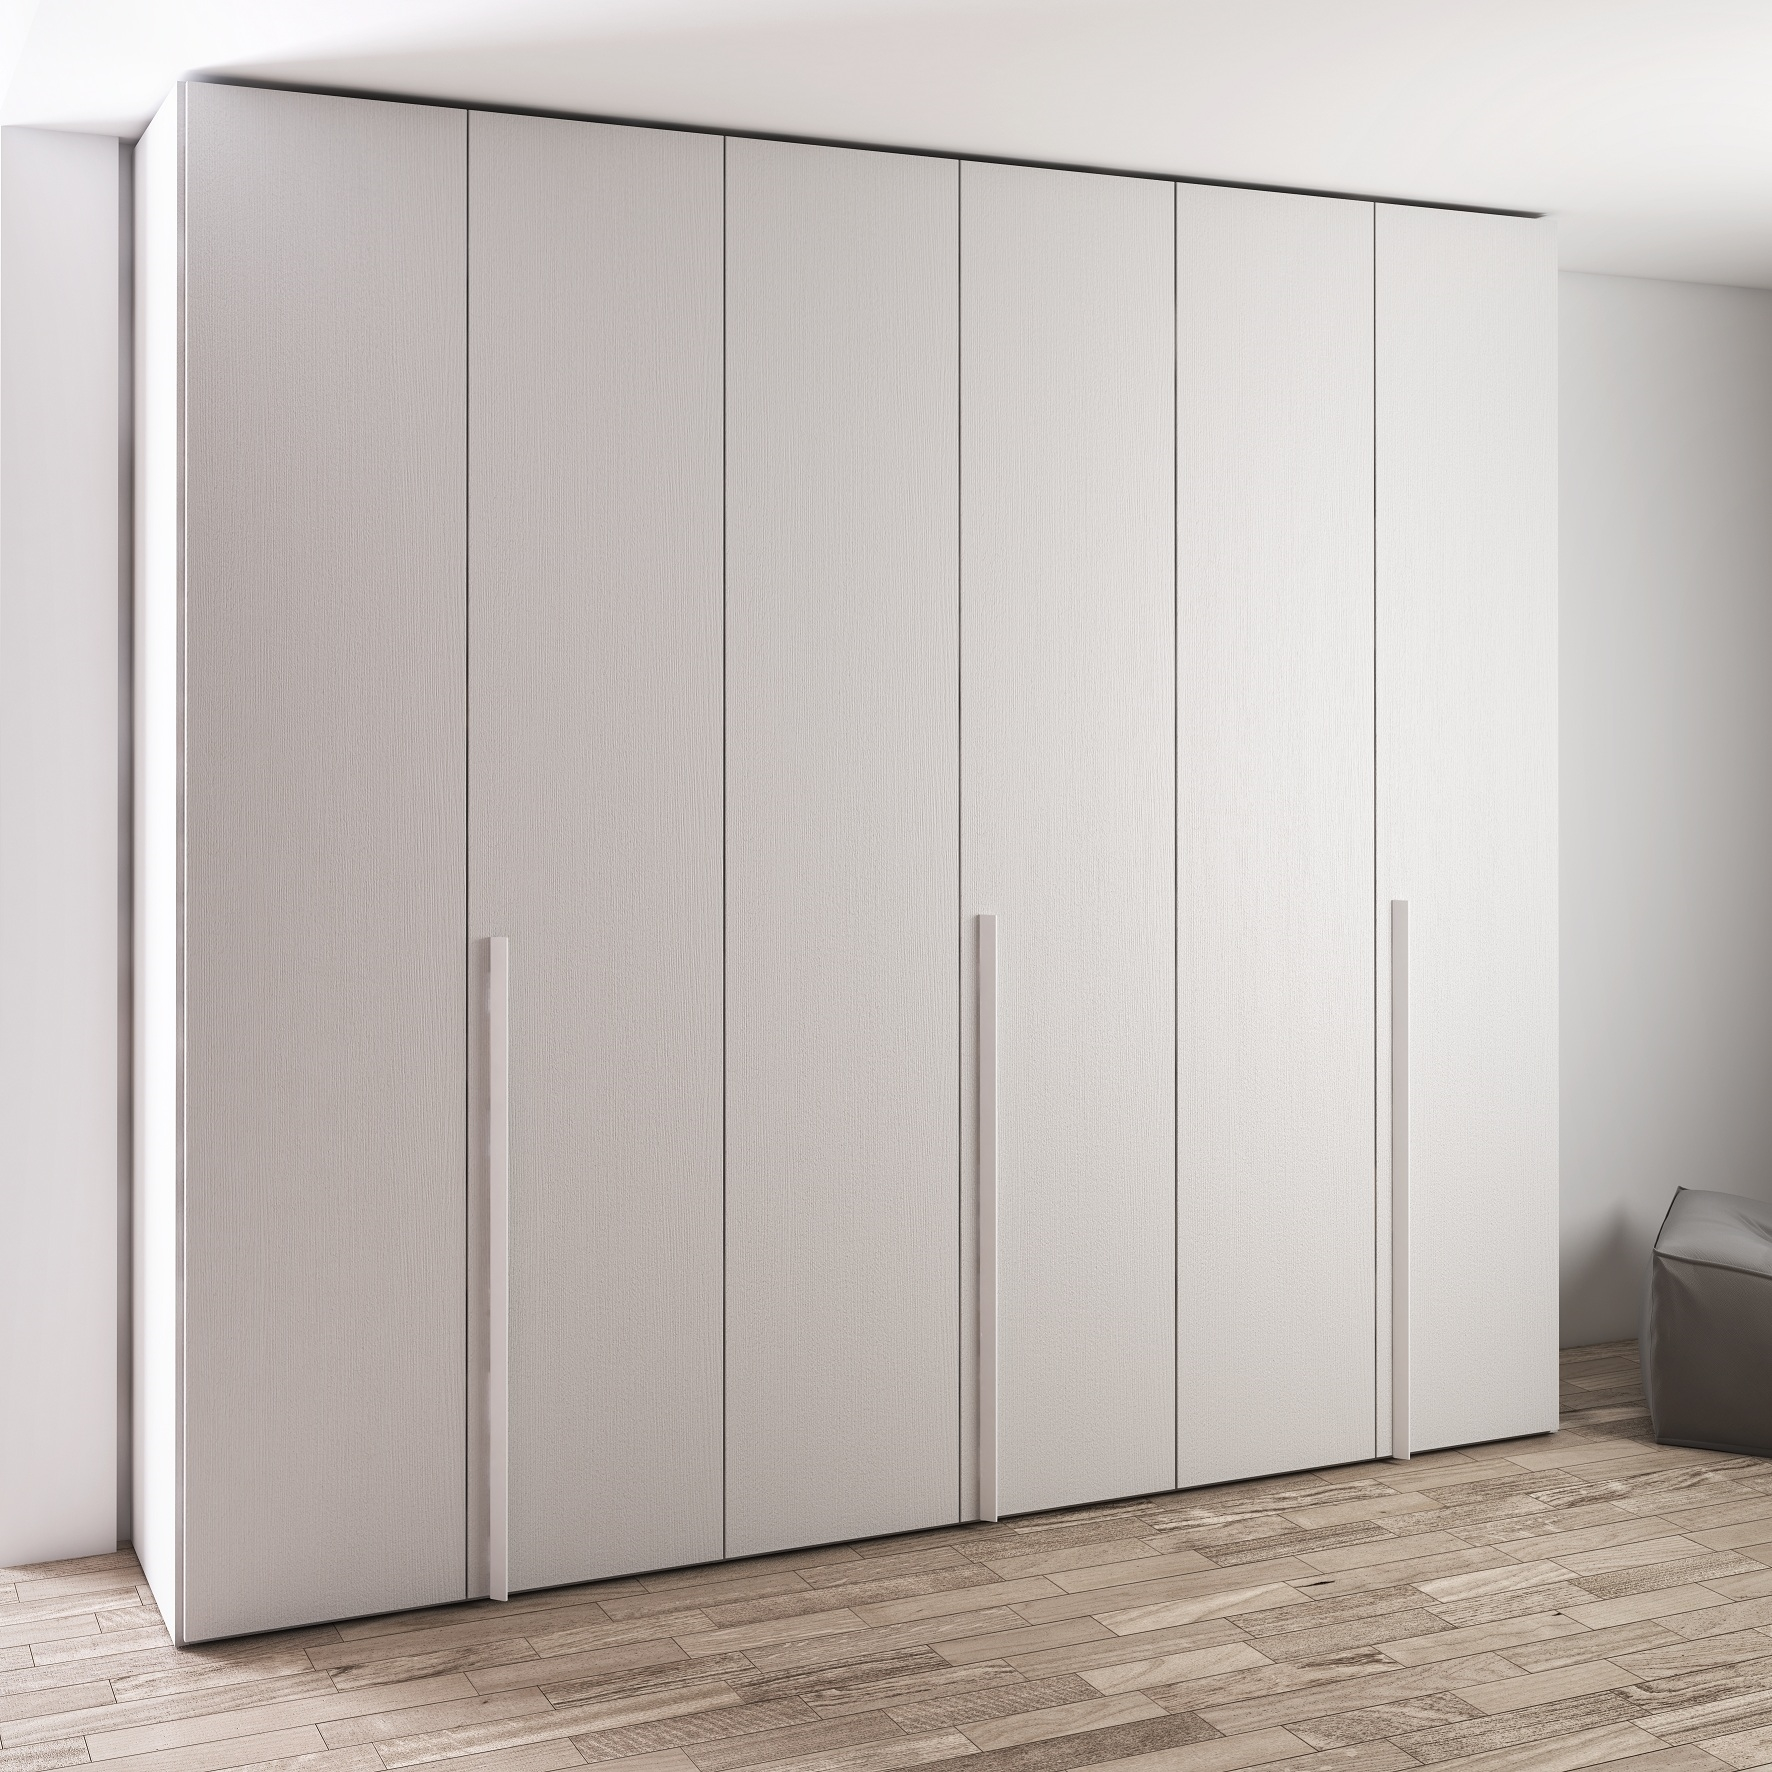 Ante vetro per armadio battente dorian idea creativa - Ante cabina armadio ...